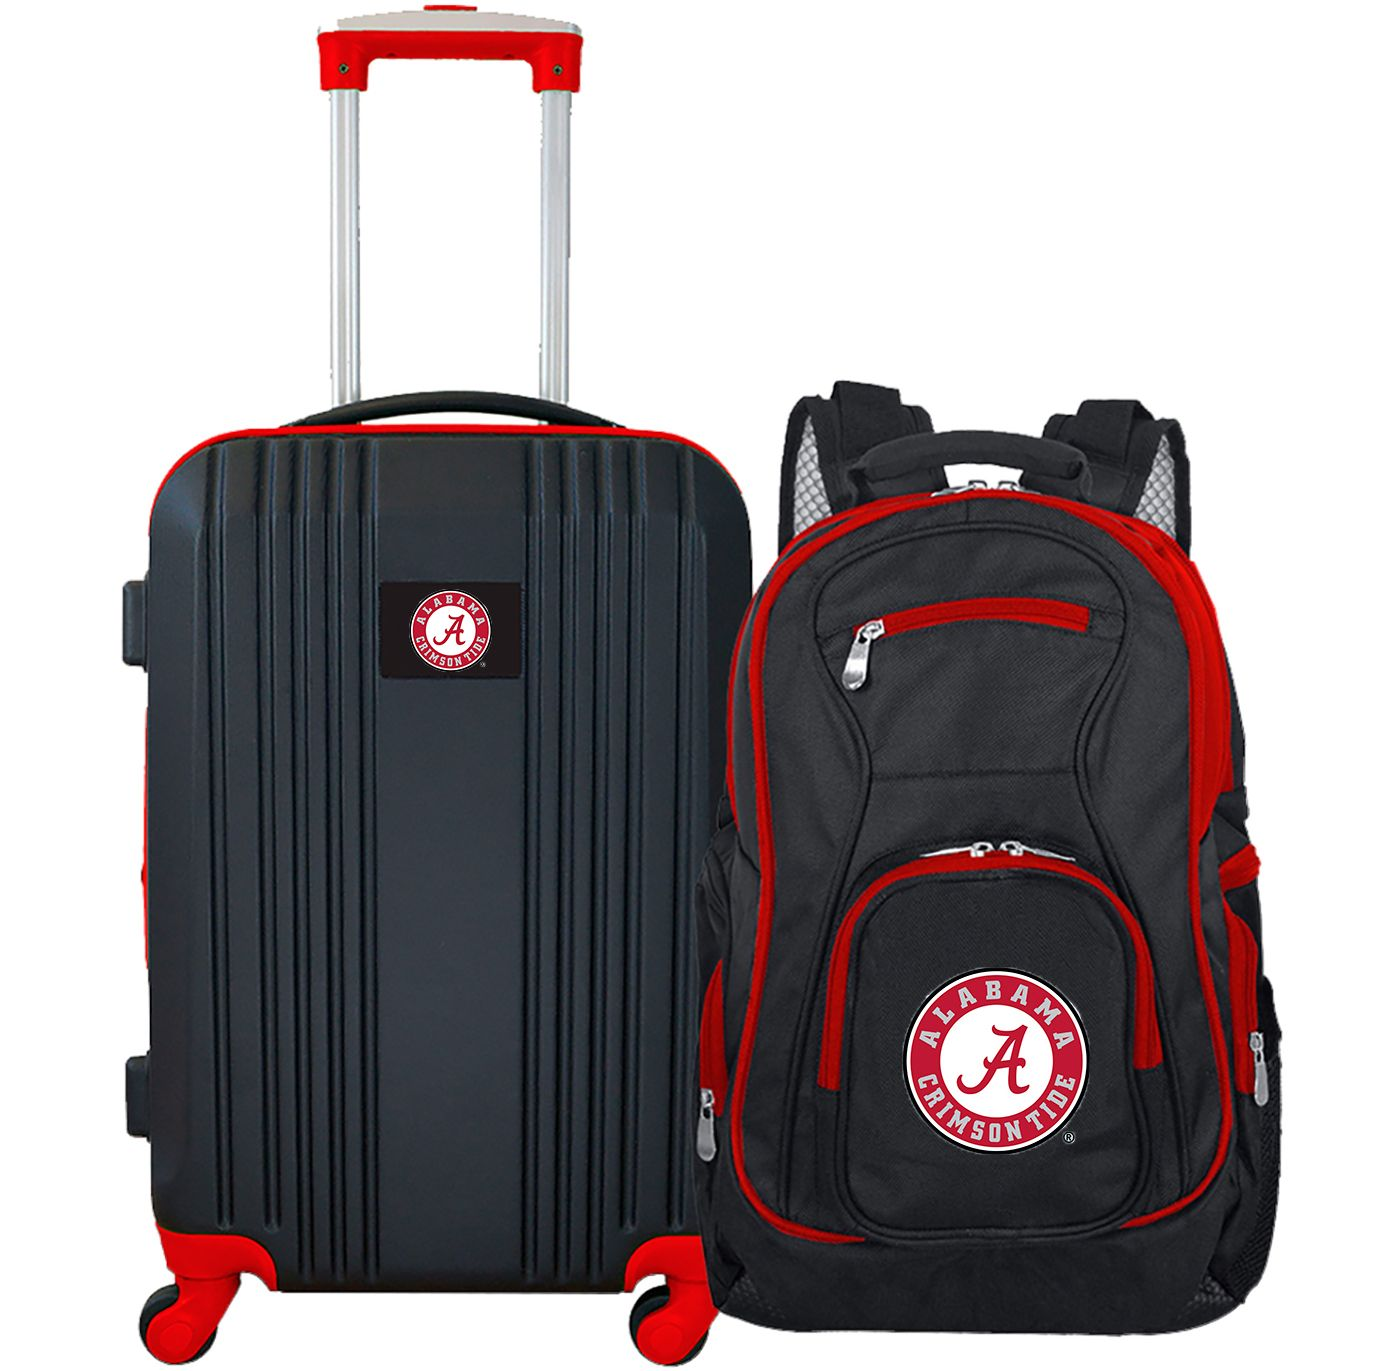 Mojo Alabama Crimson Tide Two Piece Luggage Set